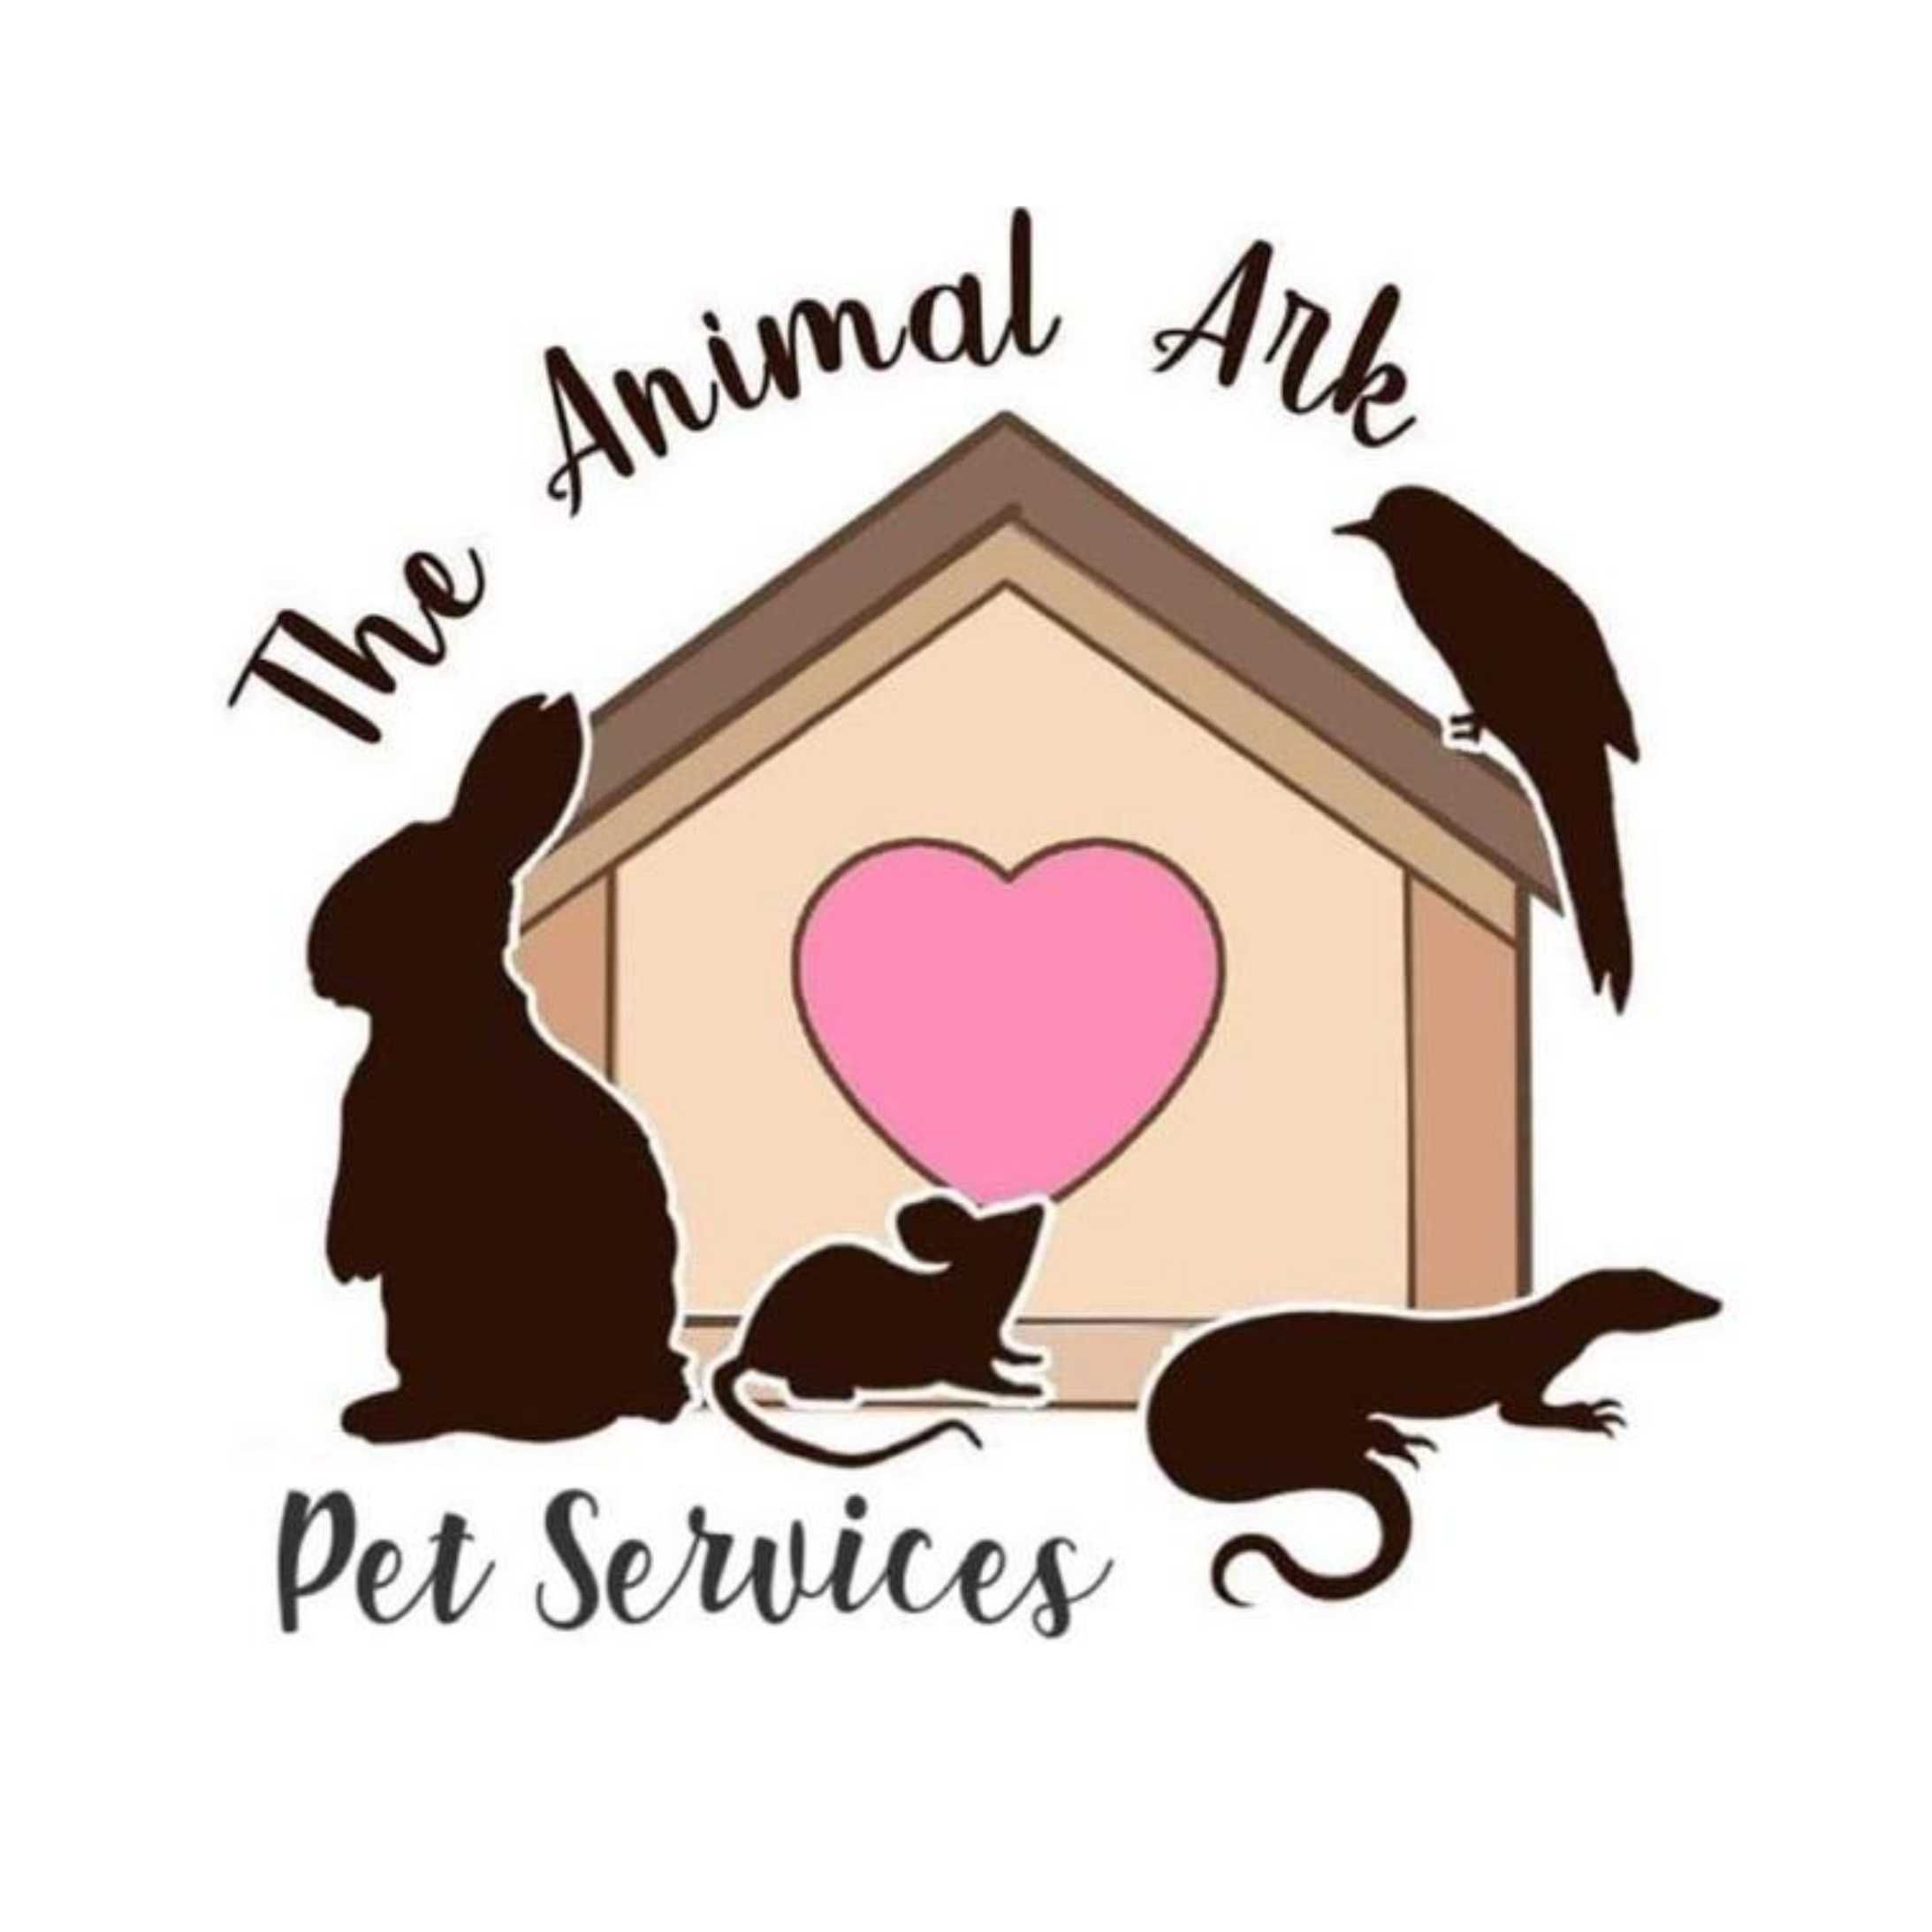 Kayley Drewitt- The Animal Ark Pet Services